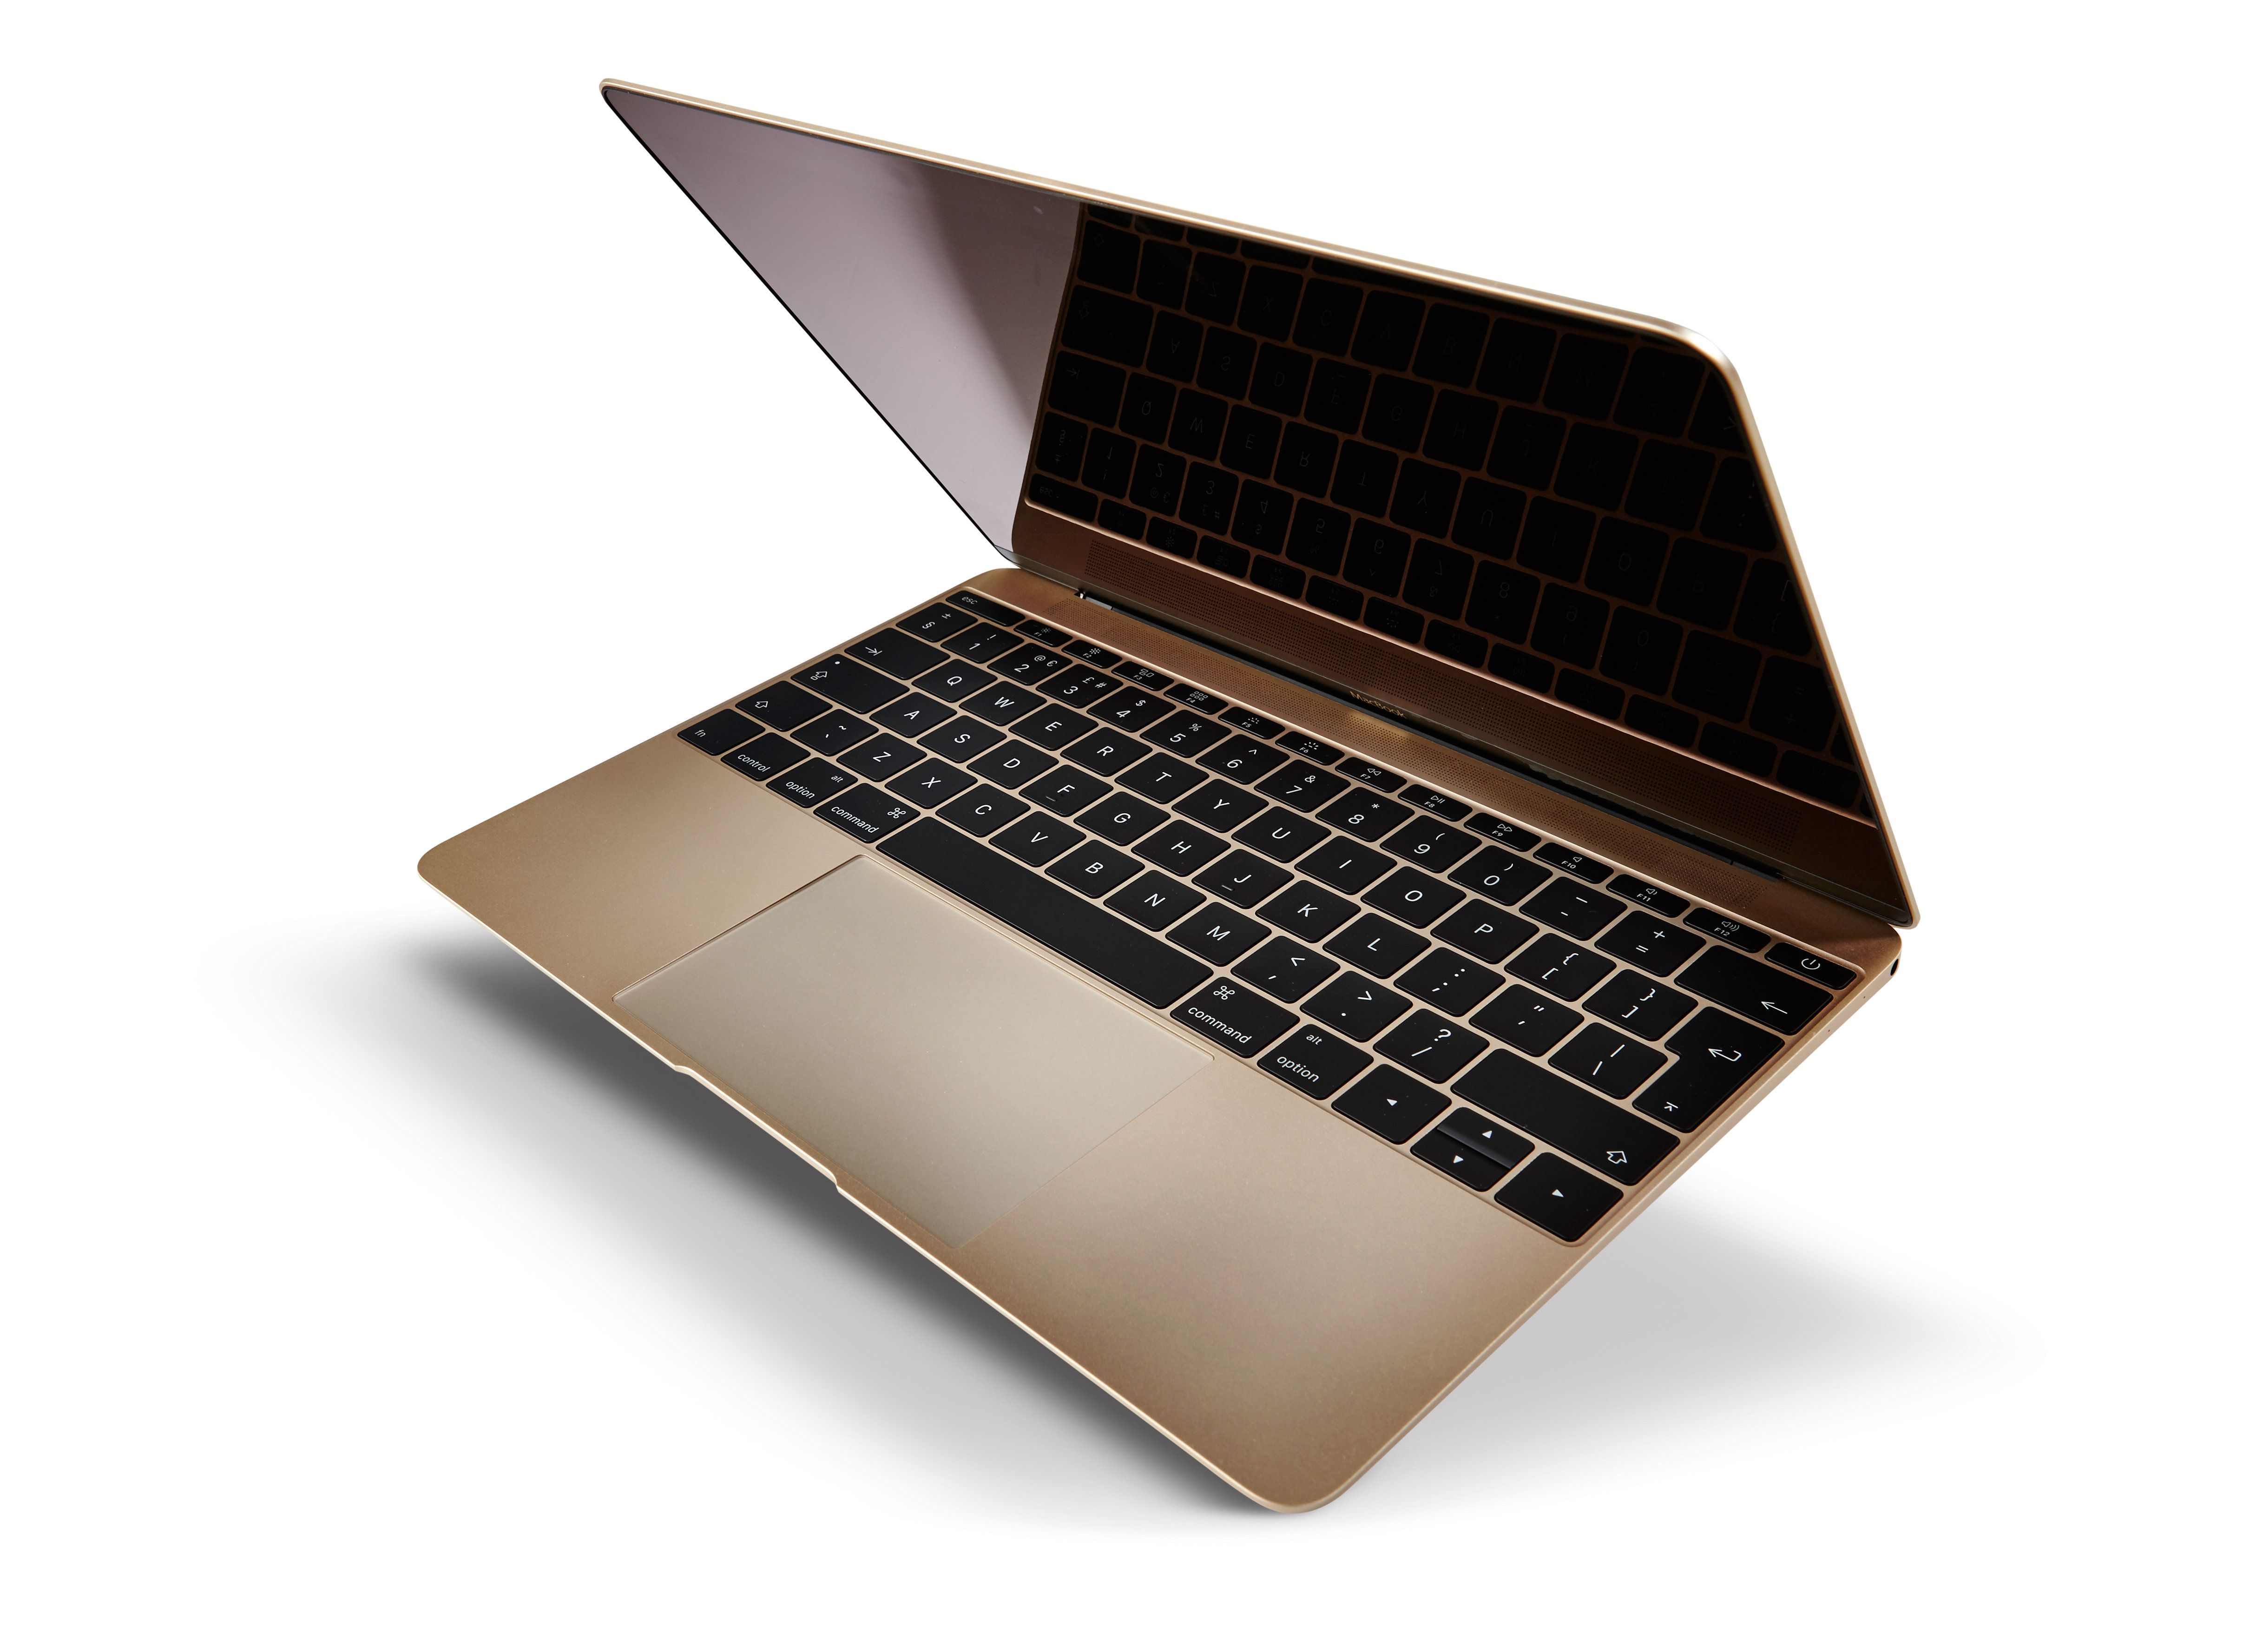 A 2015 Apple MacBook